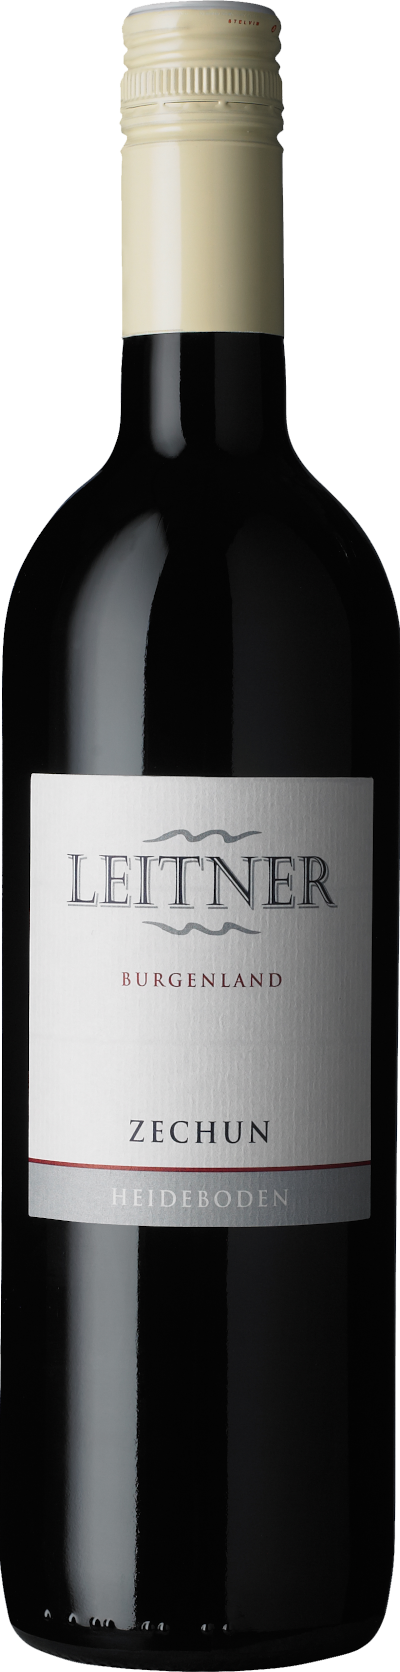 Leitner - Cuvée Zechun